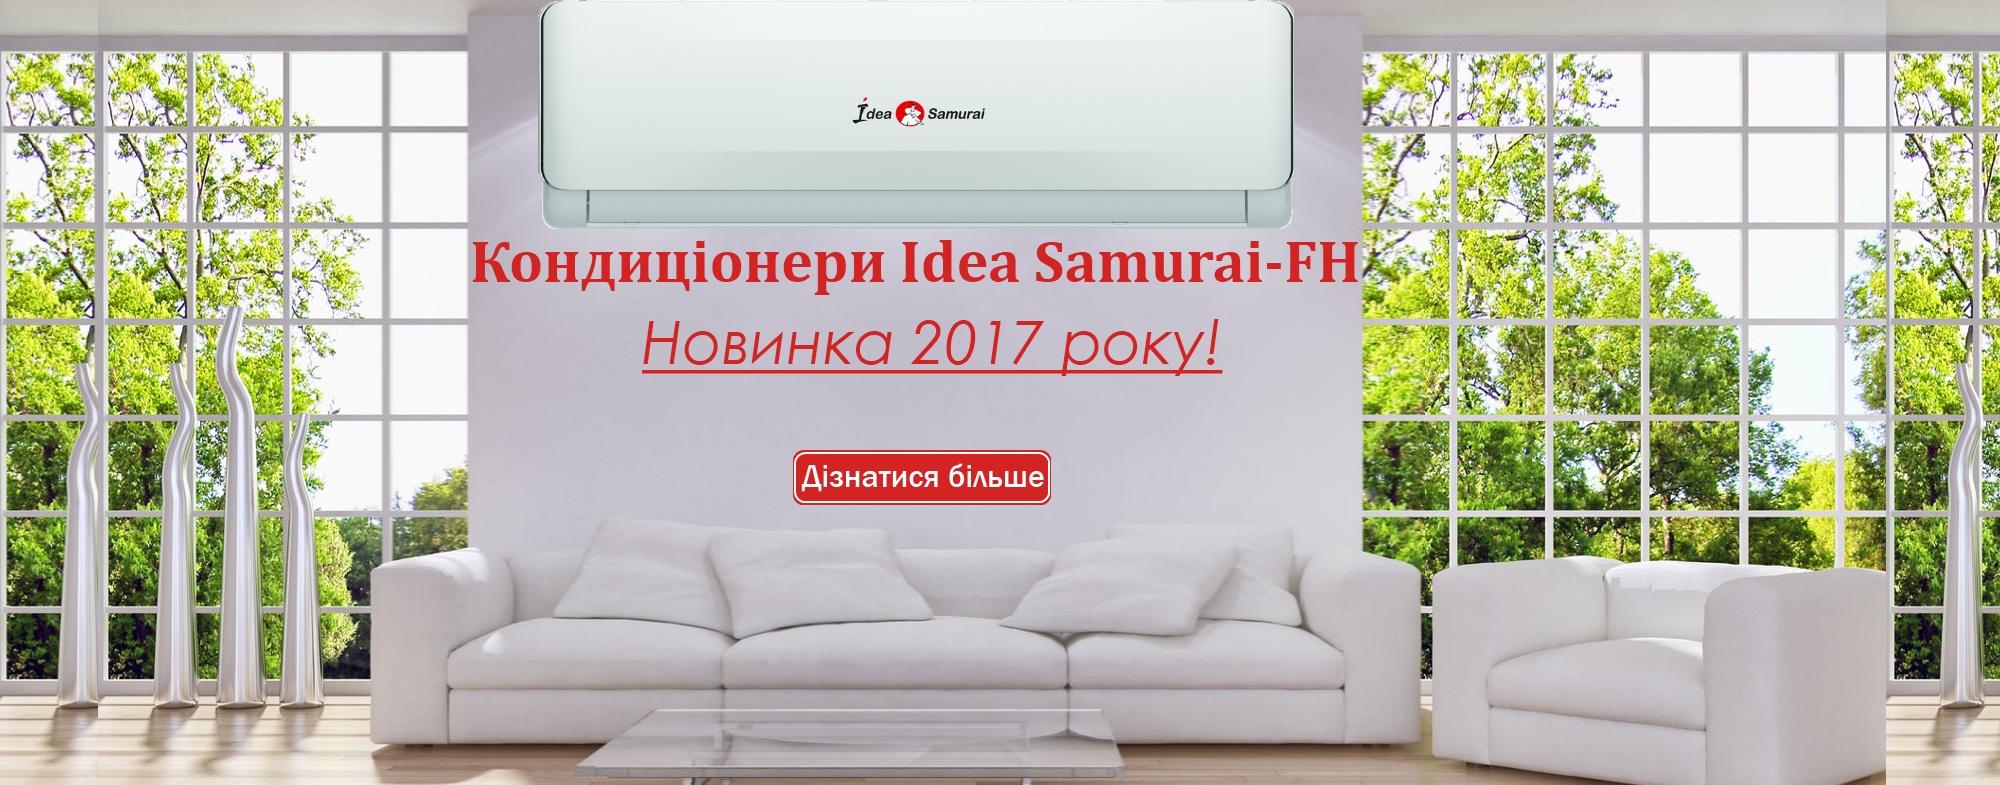 Кондиціонери Idea Samurai-FH